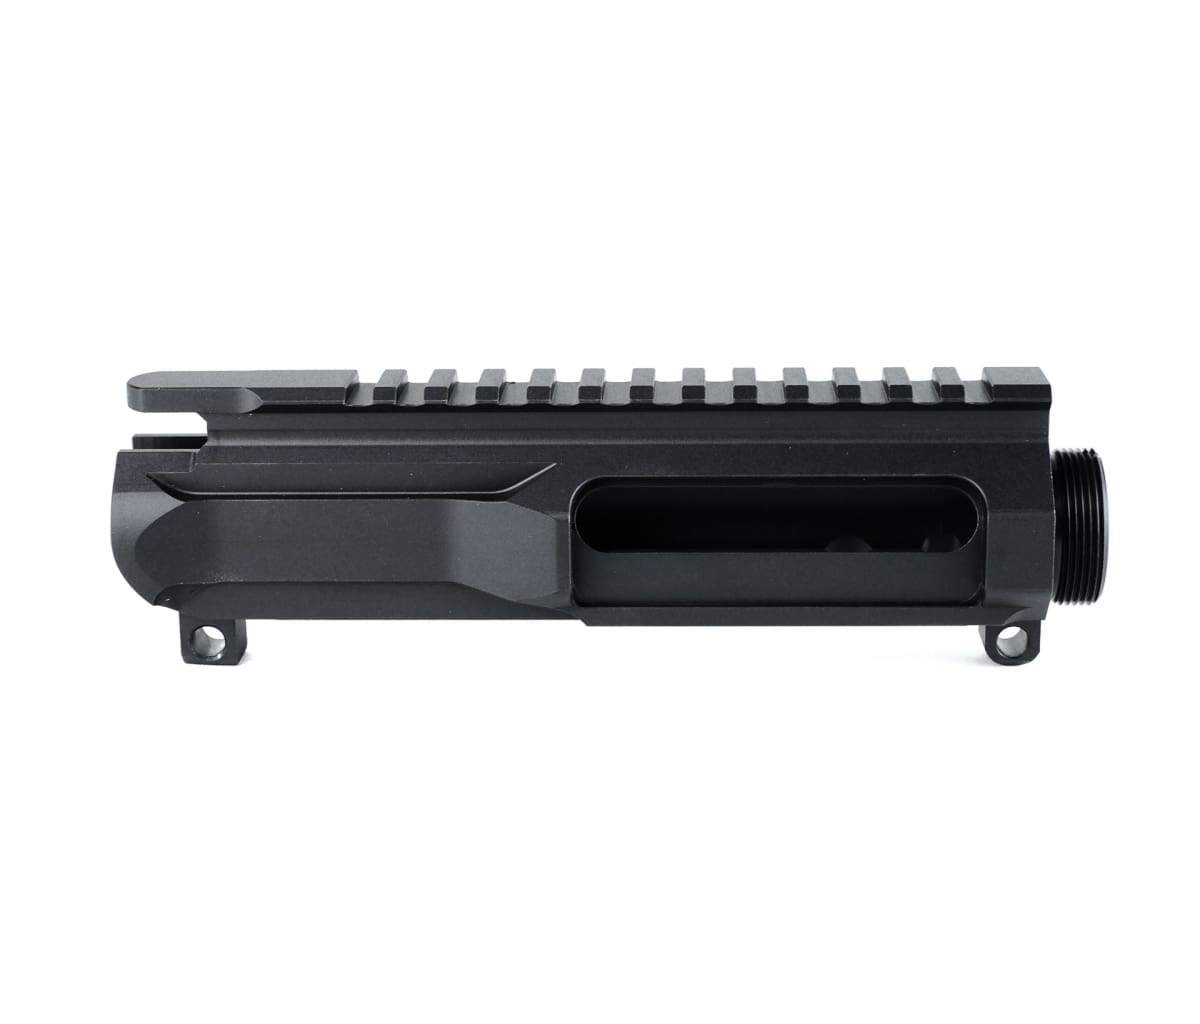 NBS Slick Side Billet Upper Receiver - AR15Discounts